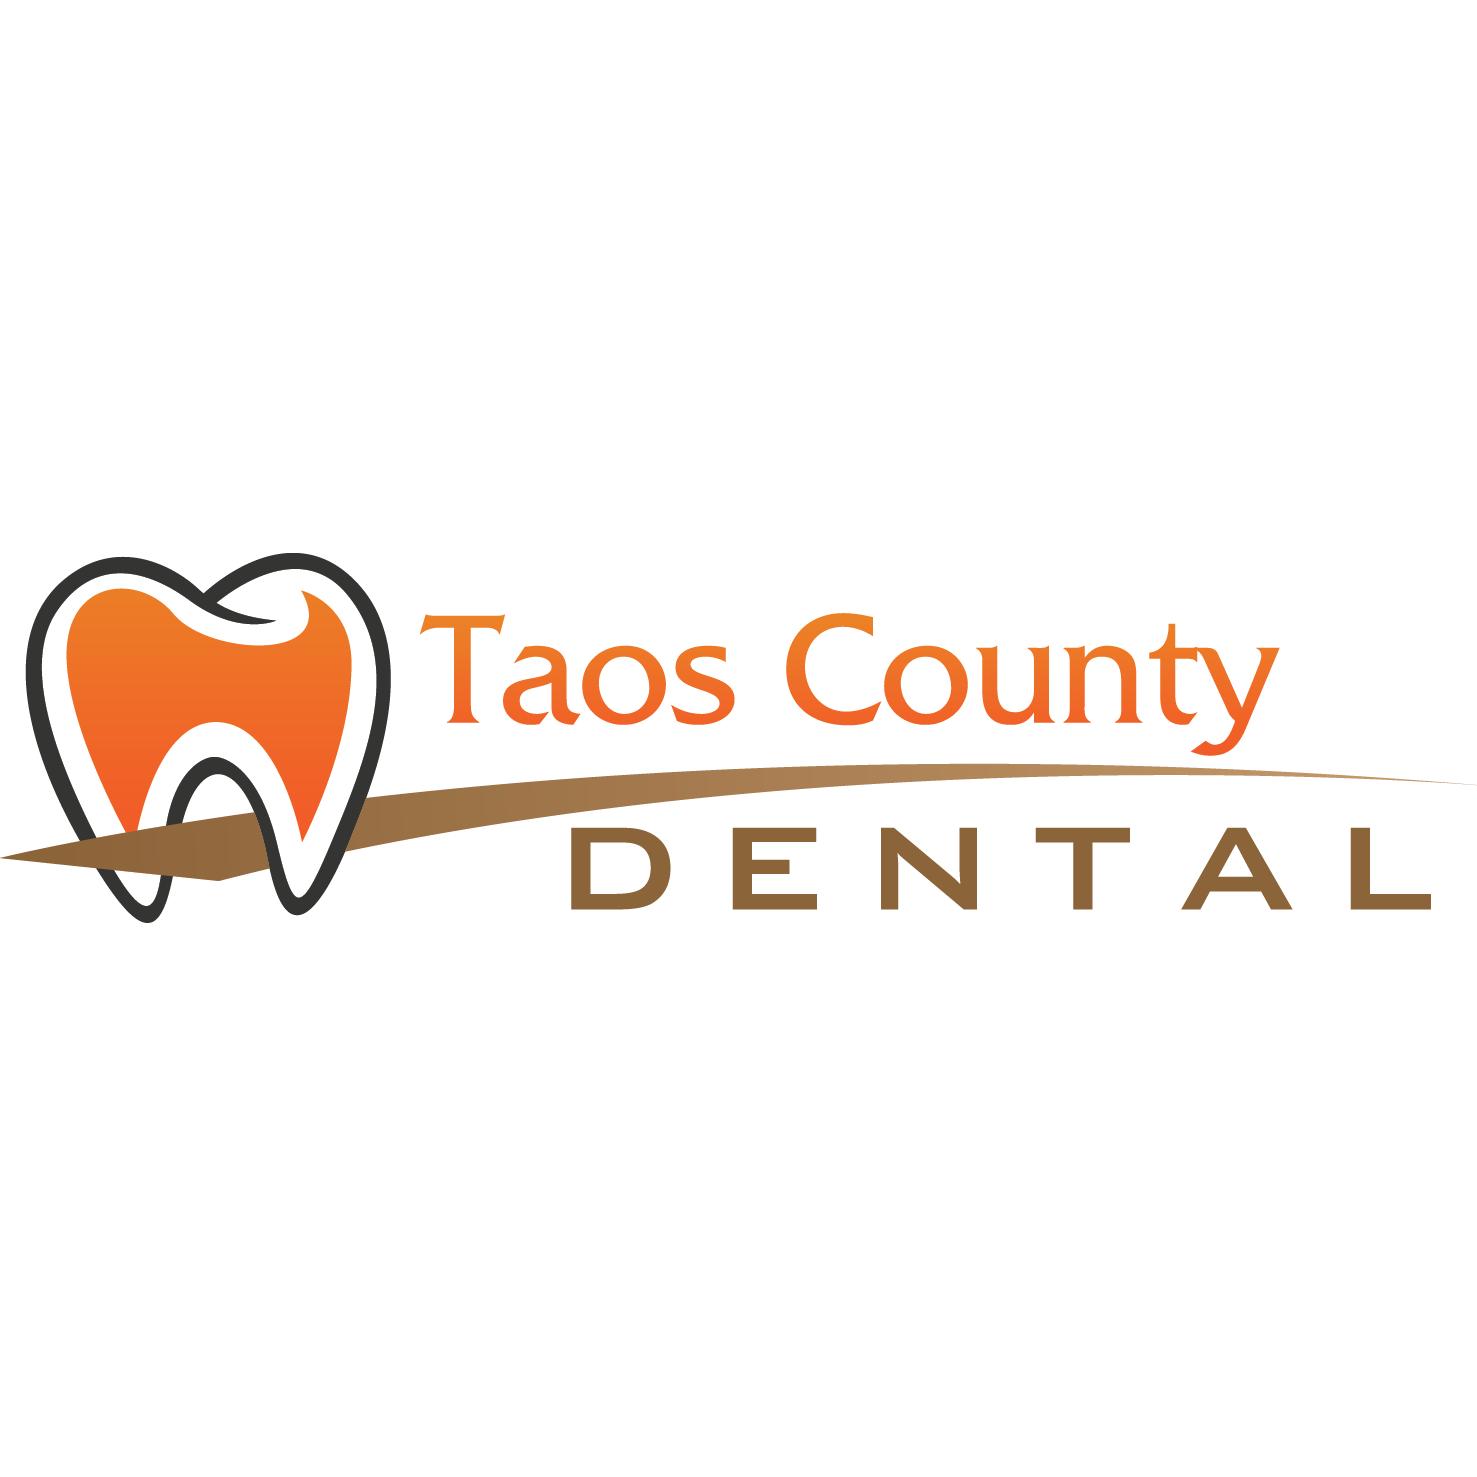 Taos County Dental Logo